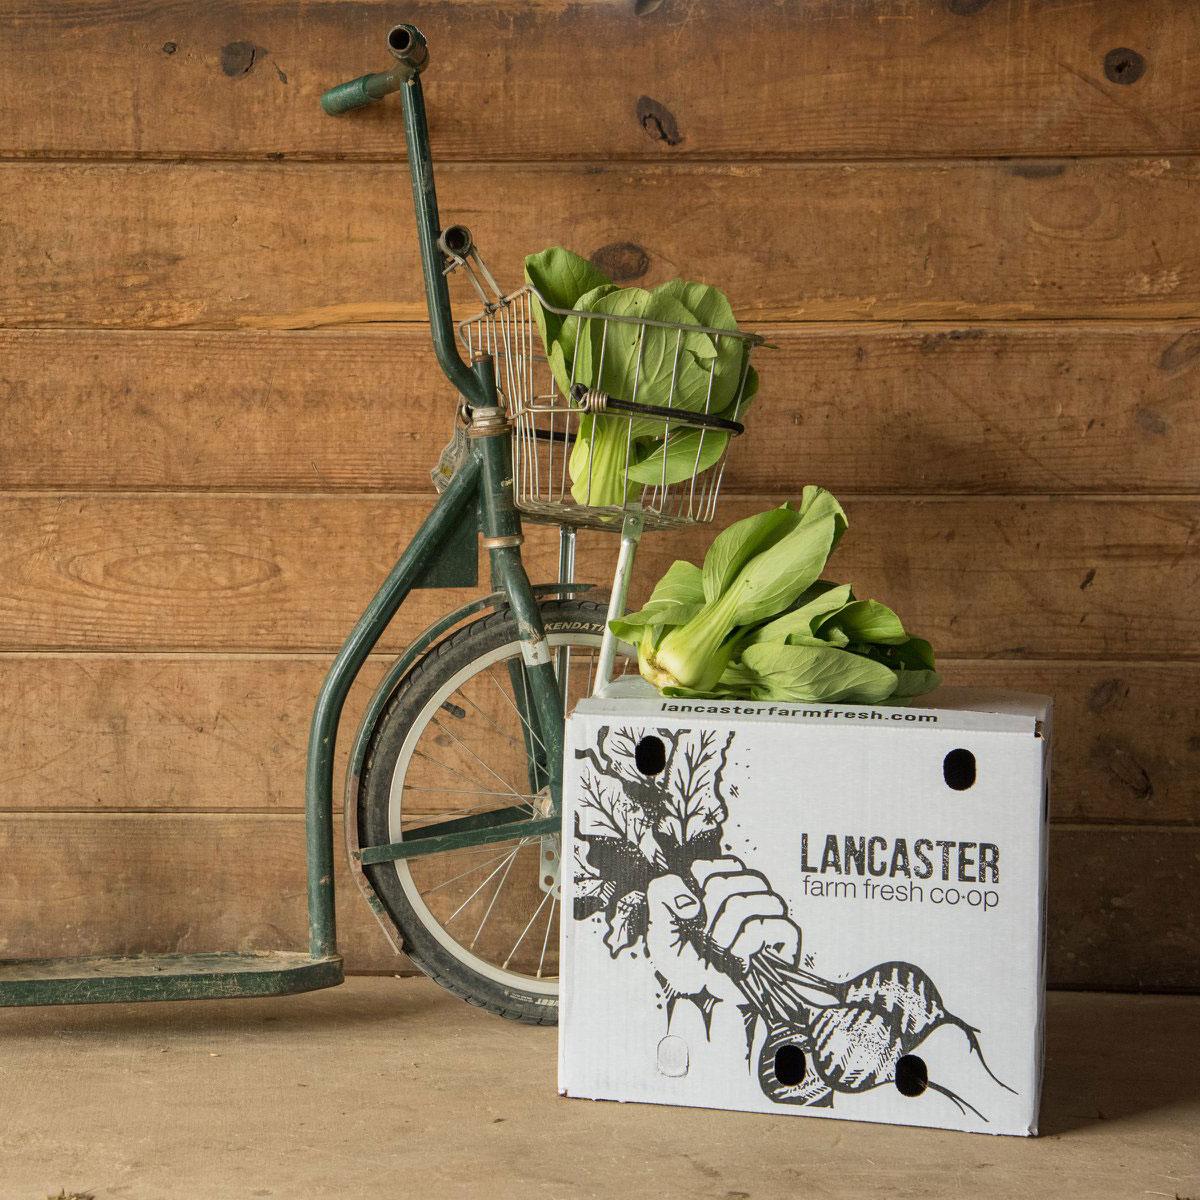 Photo Courtesy of Lancaster Farm Fresh